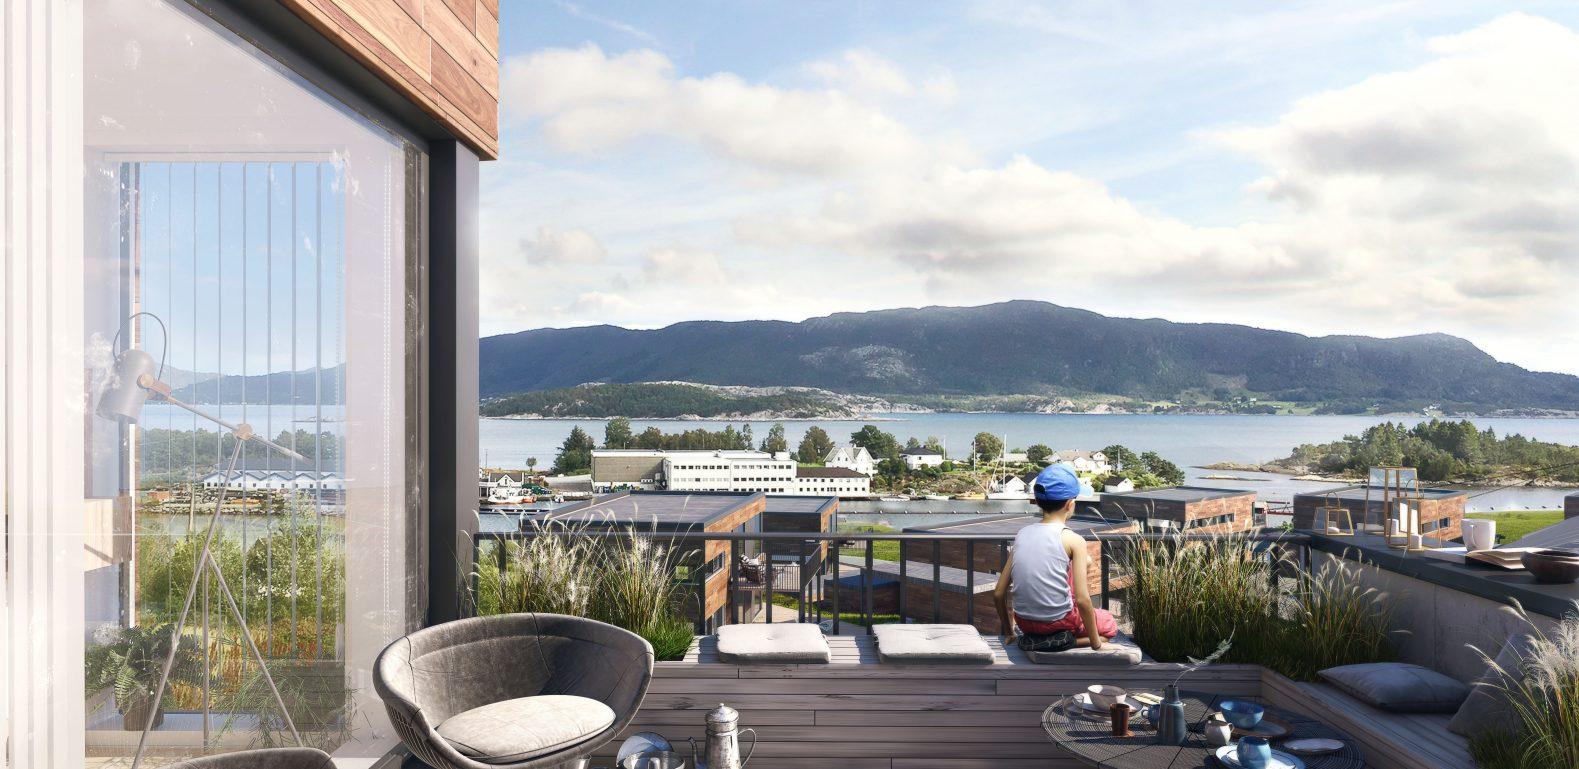 autvik_hervik_view04_exterior_balcony-1579x769.jpg